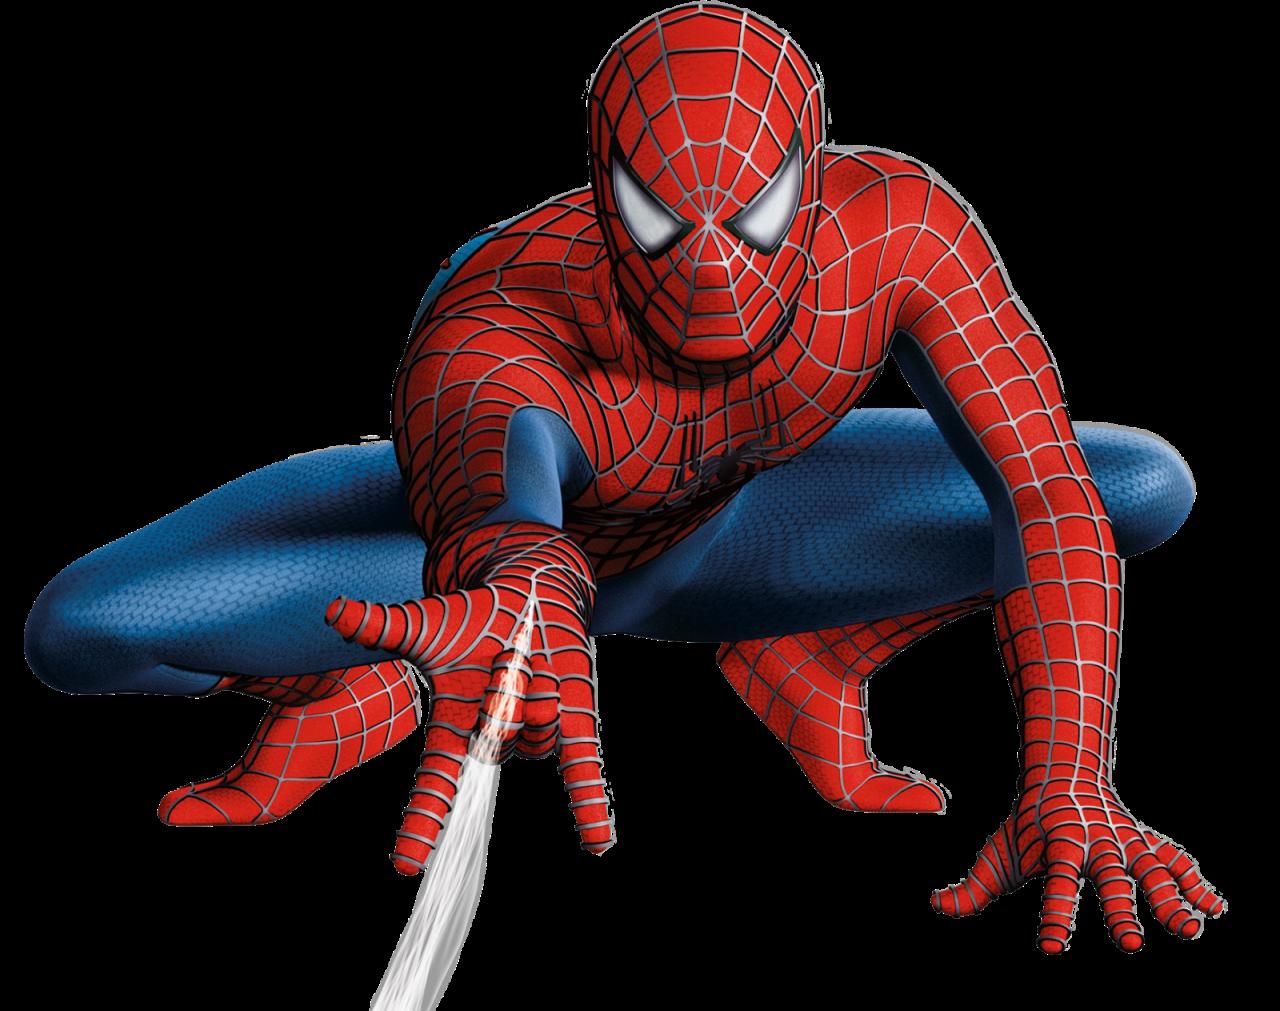 Spiderman PNG Image